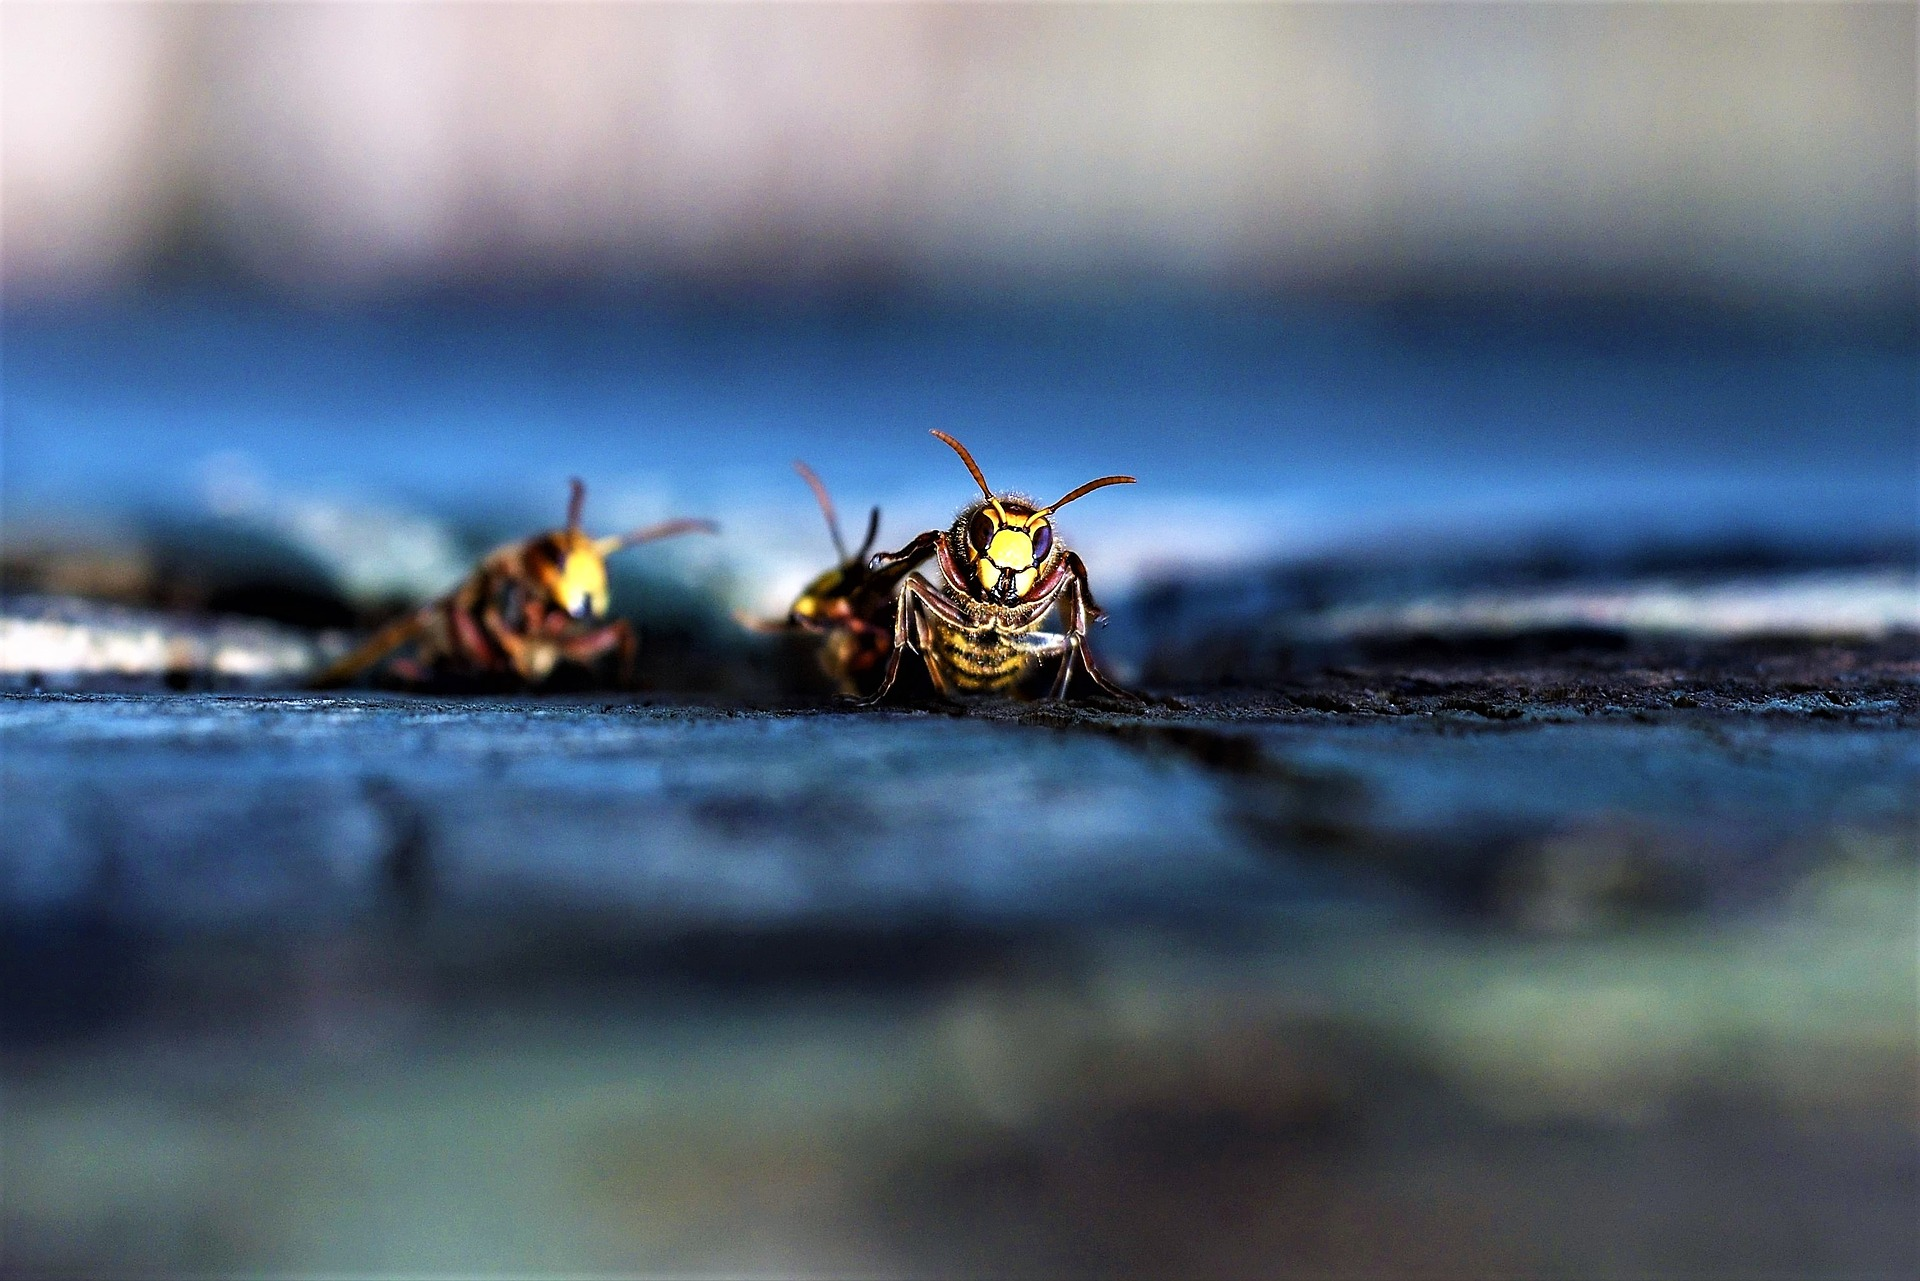 Insekten - Wespen - Fliegen - Mücken | Fliegengitter für Fenster & Türen nach Maß | www.fliegengittermacher.de